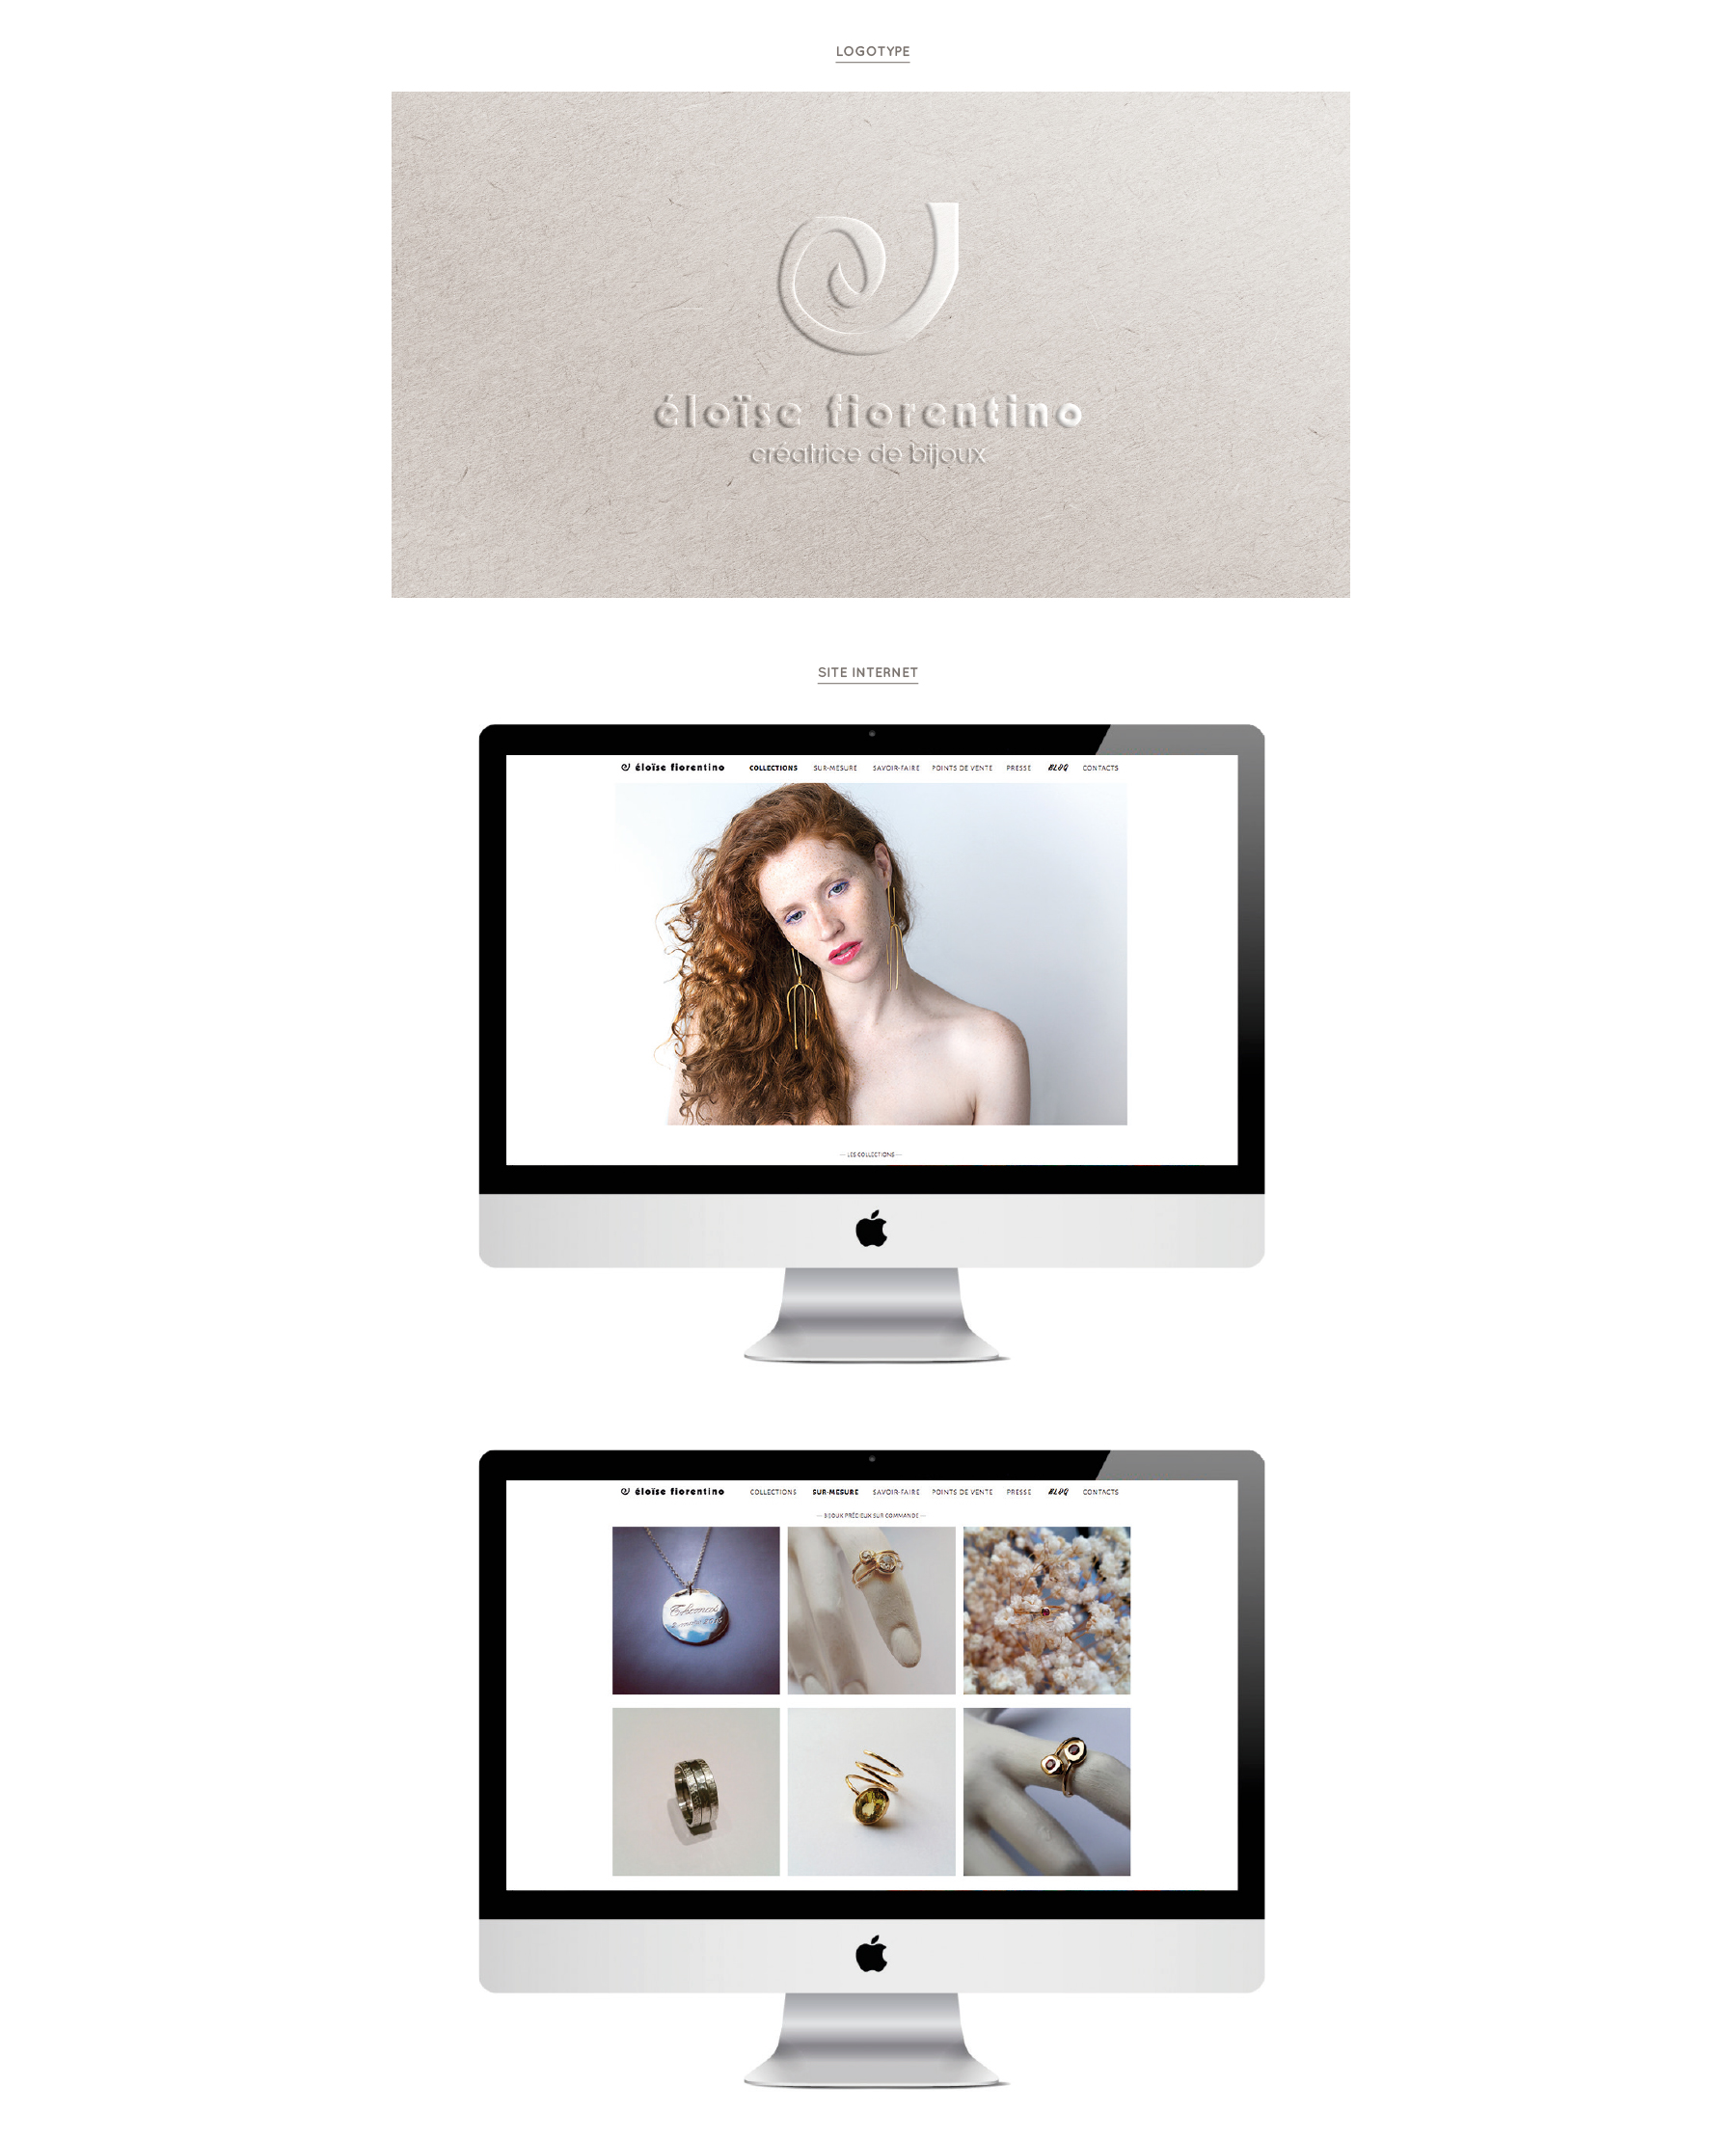 daniella_projets_site_eloise_1-1